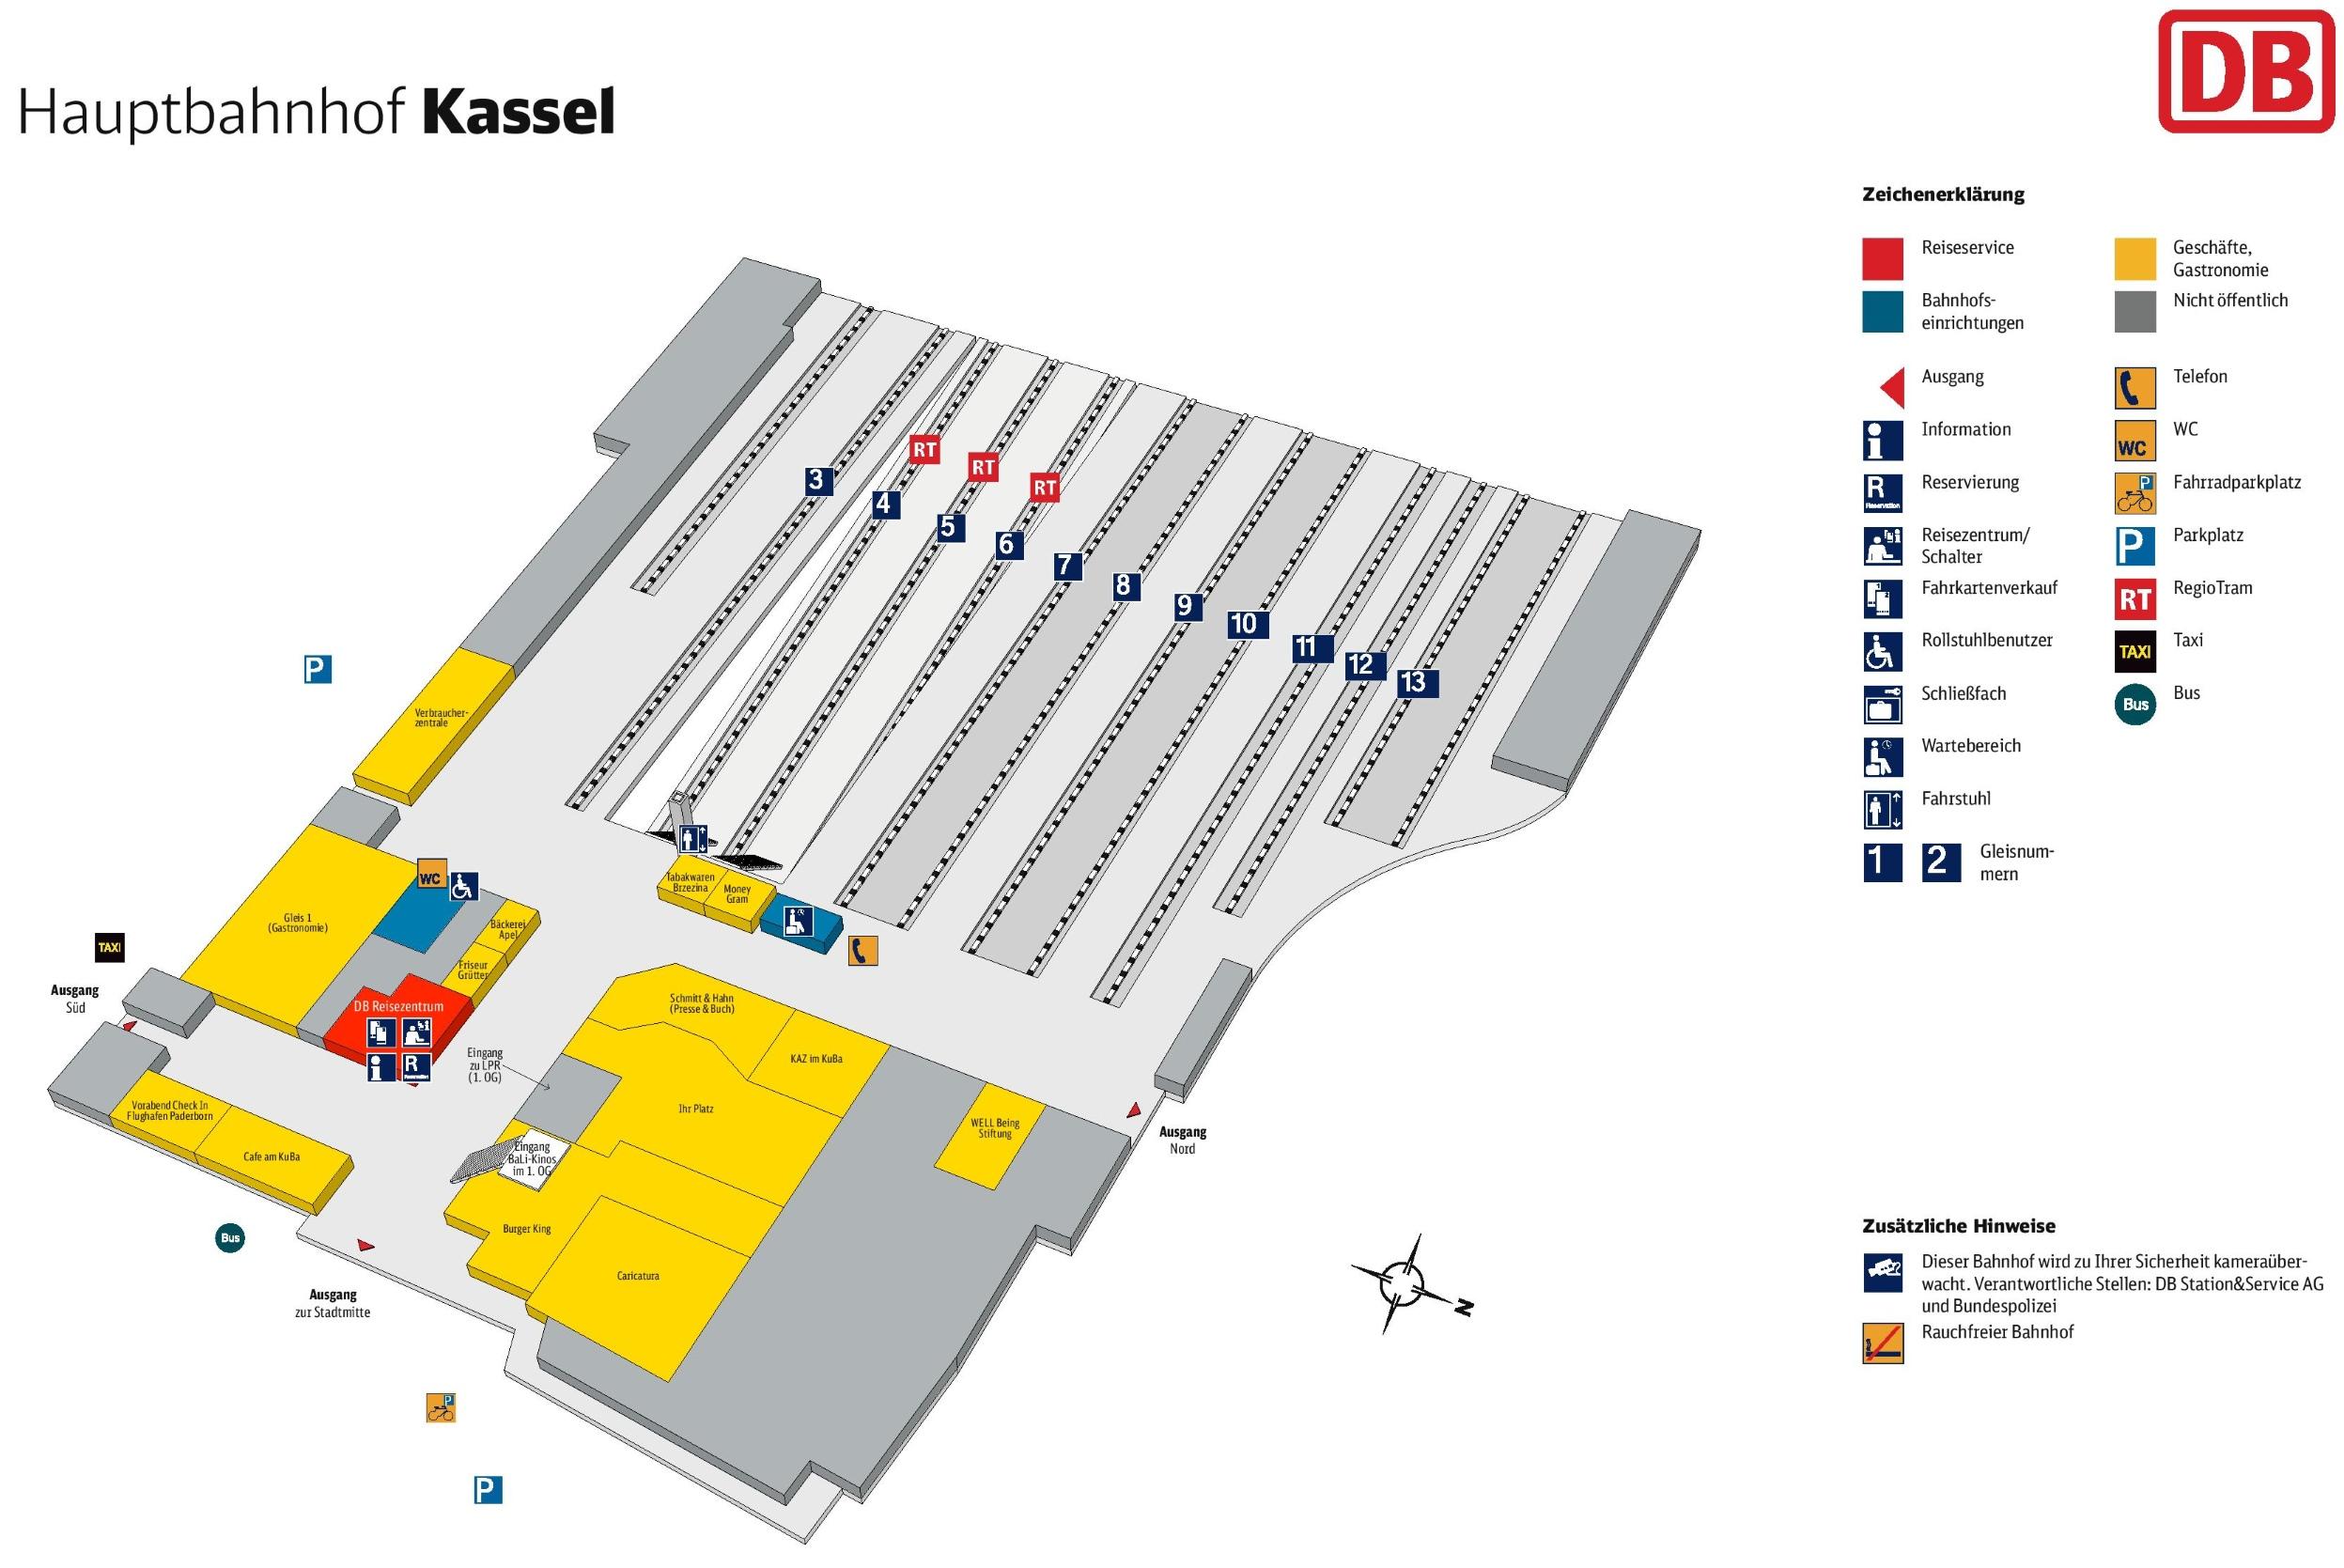 Kassel hauptbahnhof map